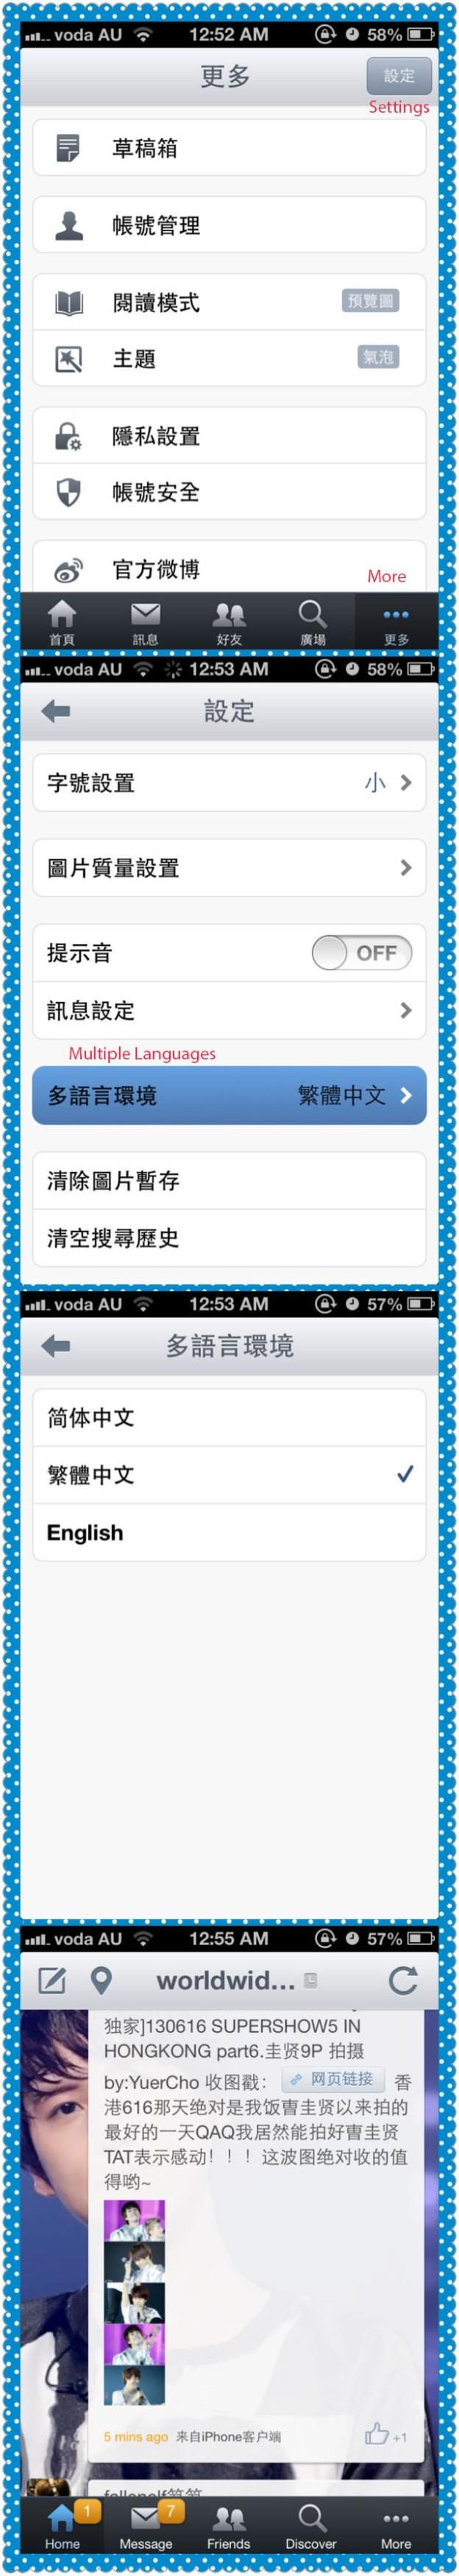 Weibo_Change to Eng app